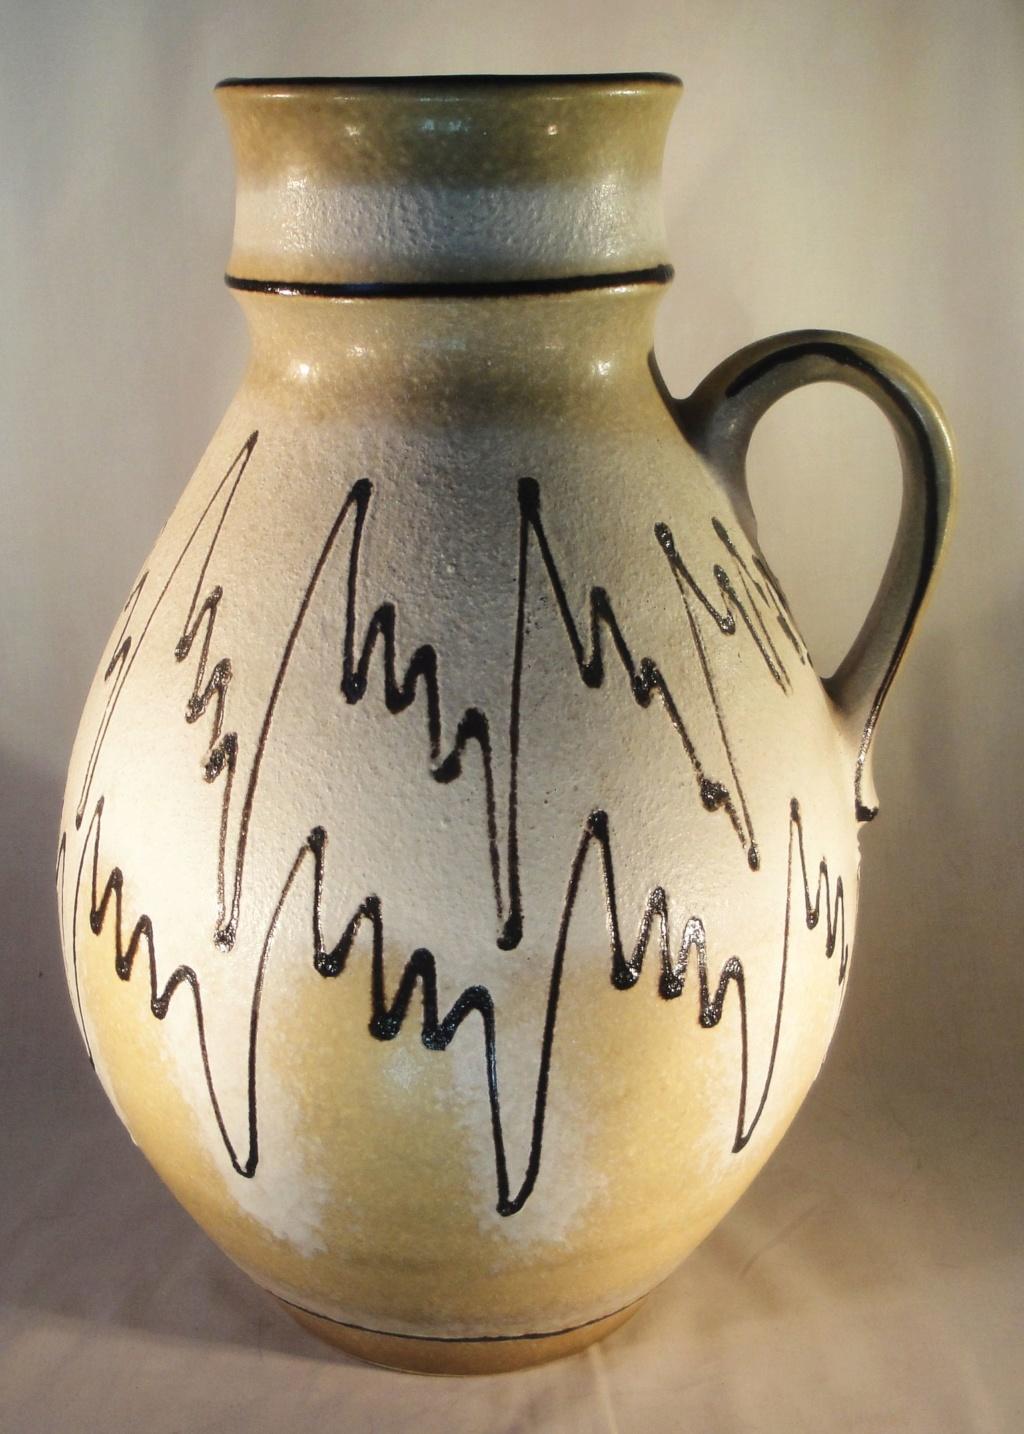 Large German handled vase - Ü-Keramik  German10